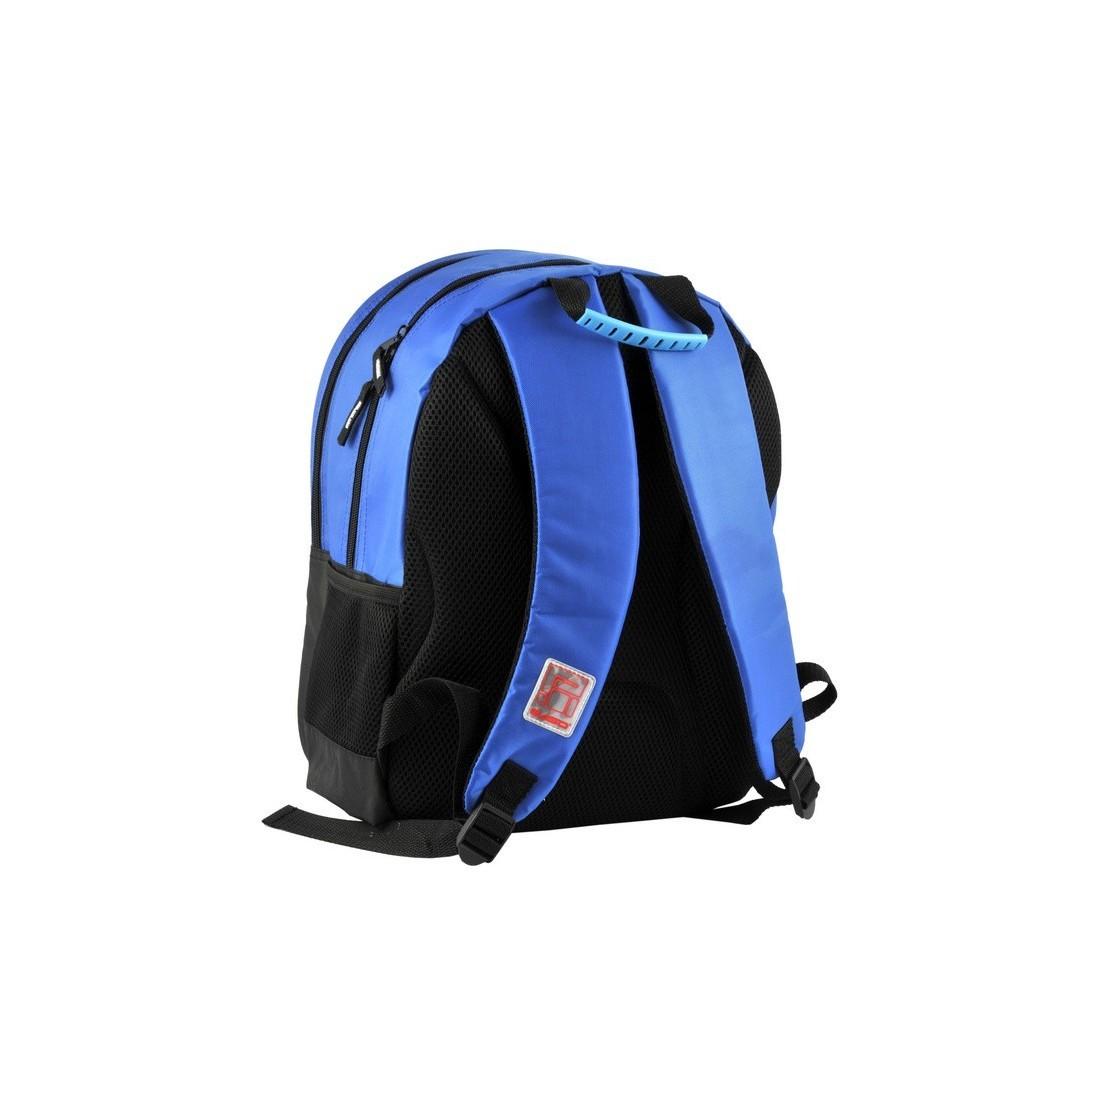 Plecak z piłką niebieski - plecak-tornister.pl